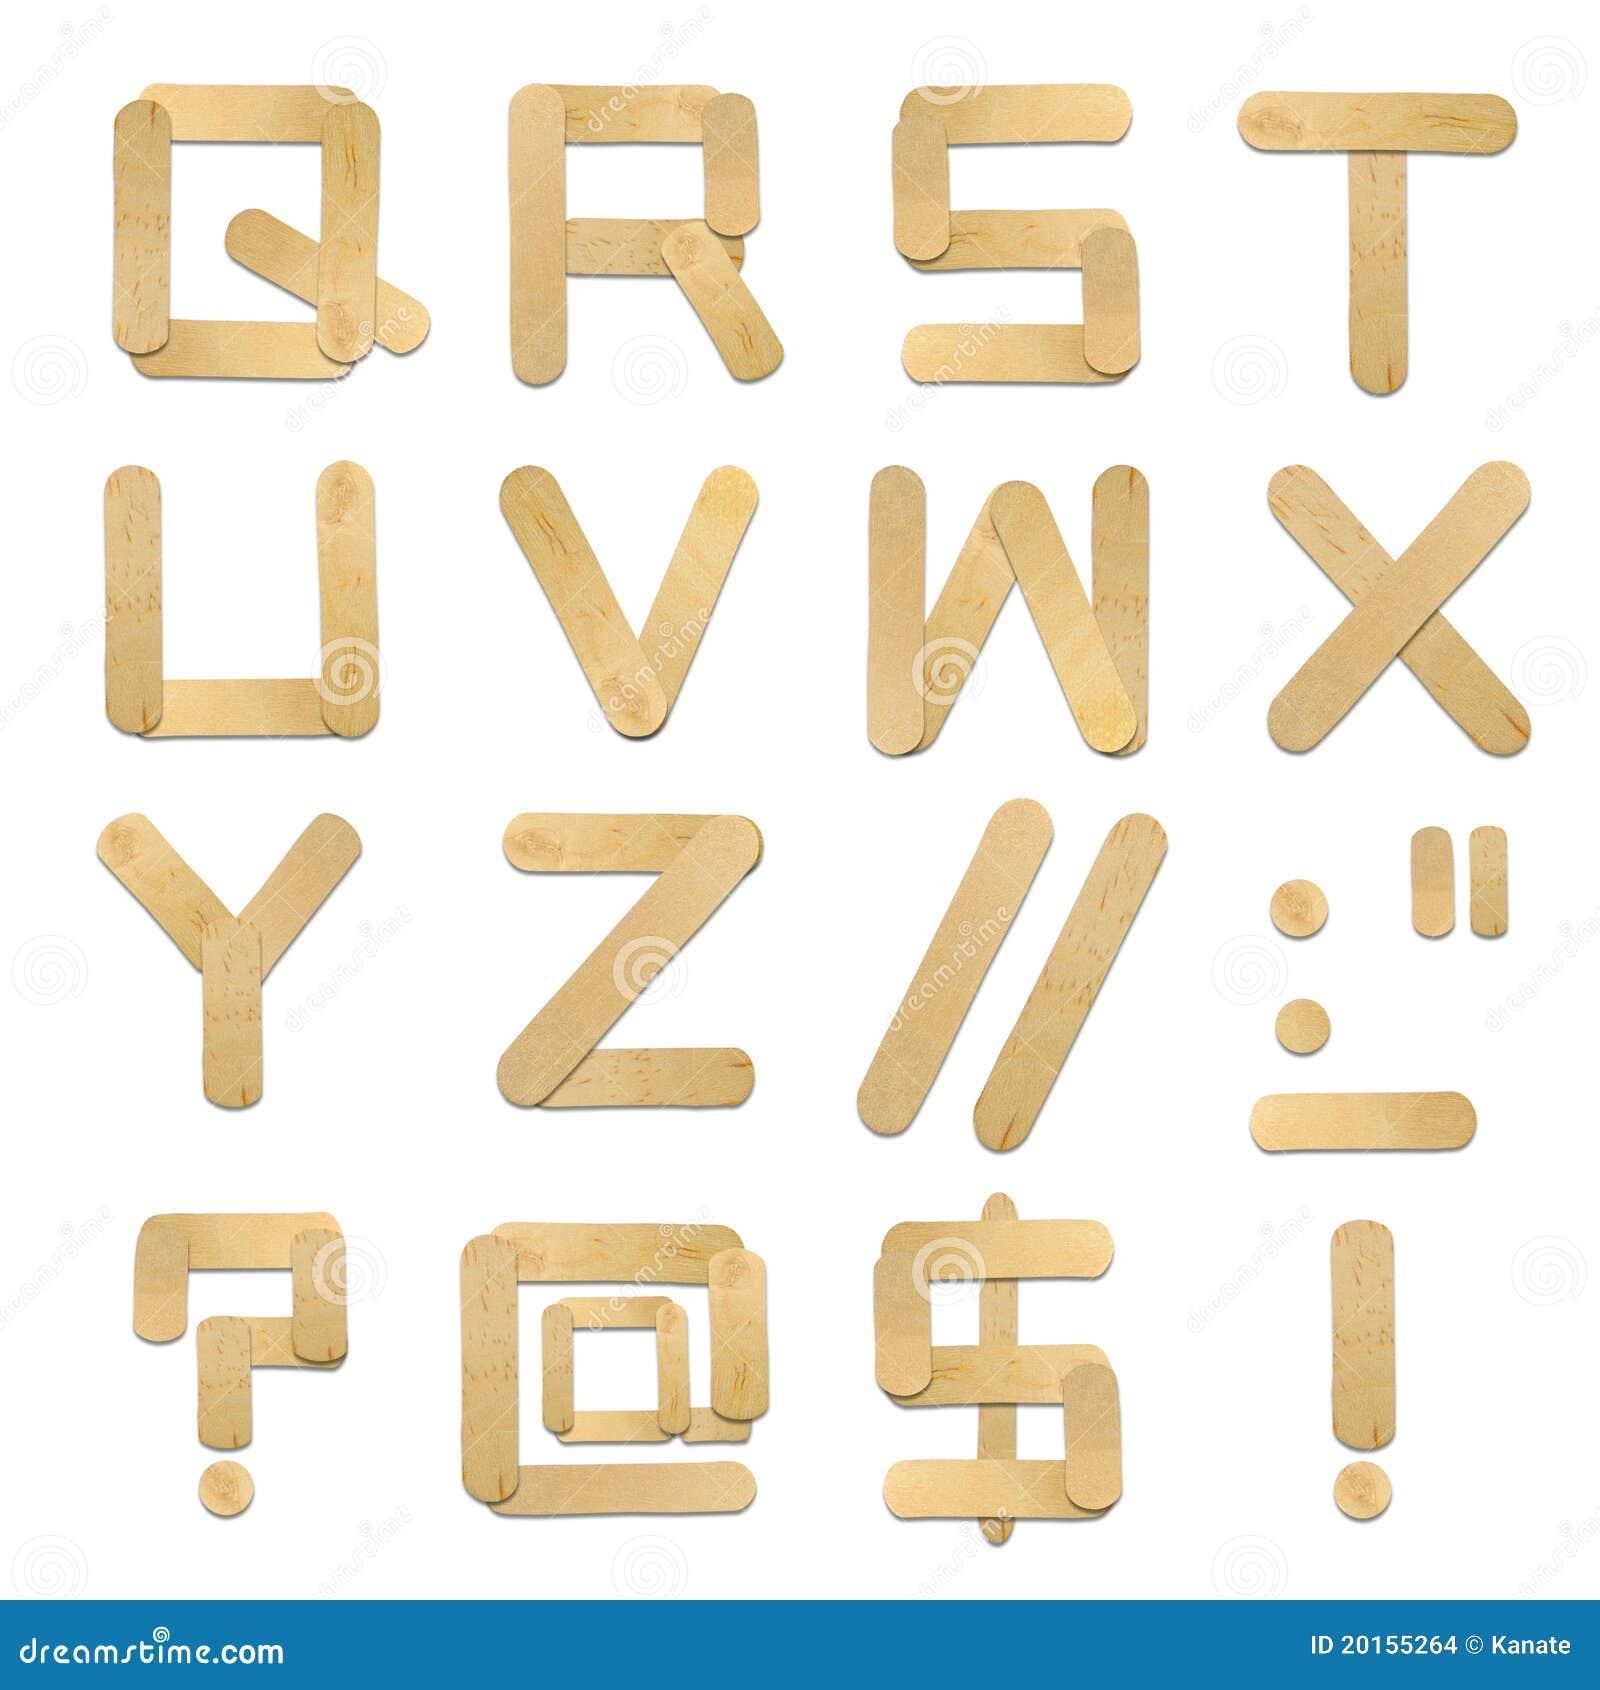 alphabet wood ice cream stick stock images